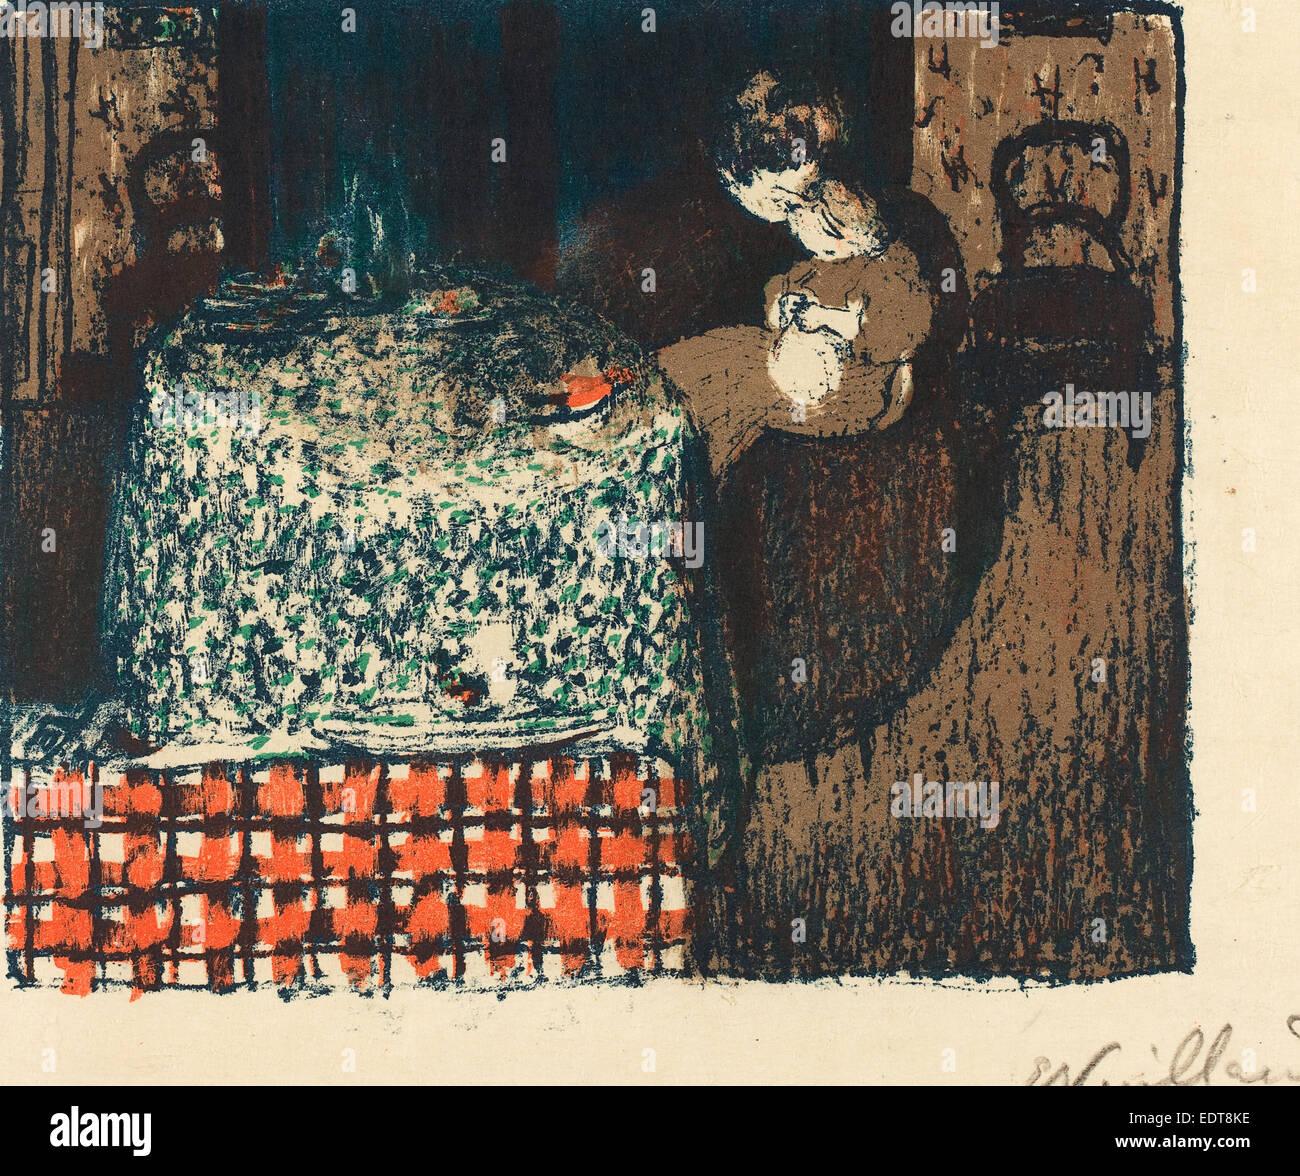 Edouard Vuillard (French, 1868 - 1940), Motherhood (Maternité), 1896, 4 color lithograph on japan paper - Stock Image